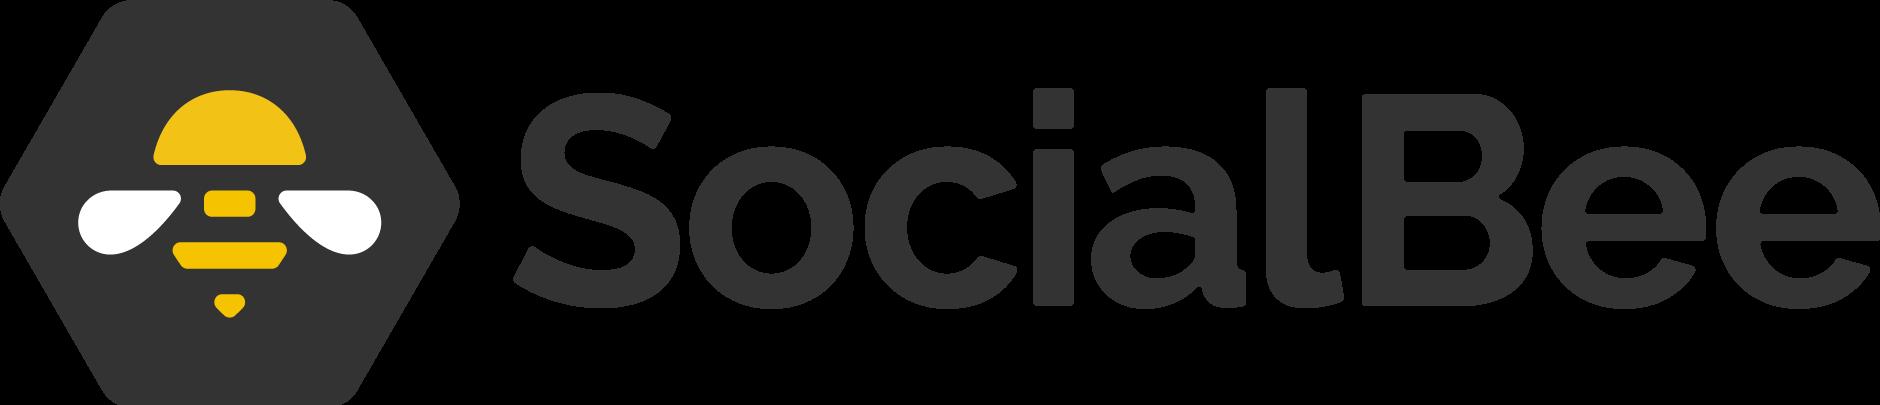 SocialBee-logo-whitebackground.png